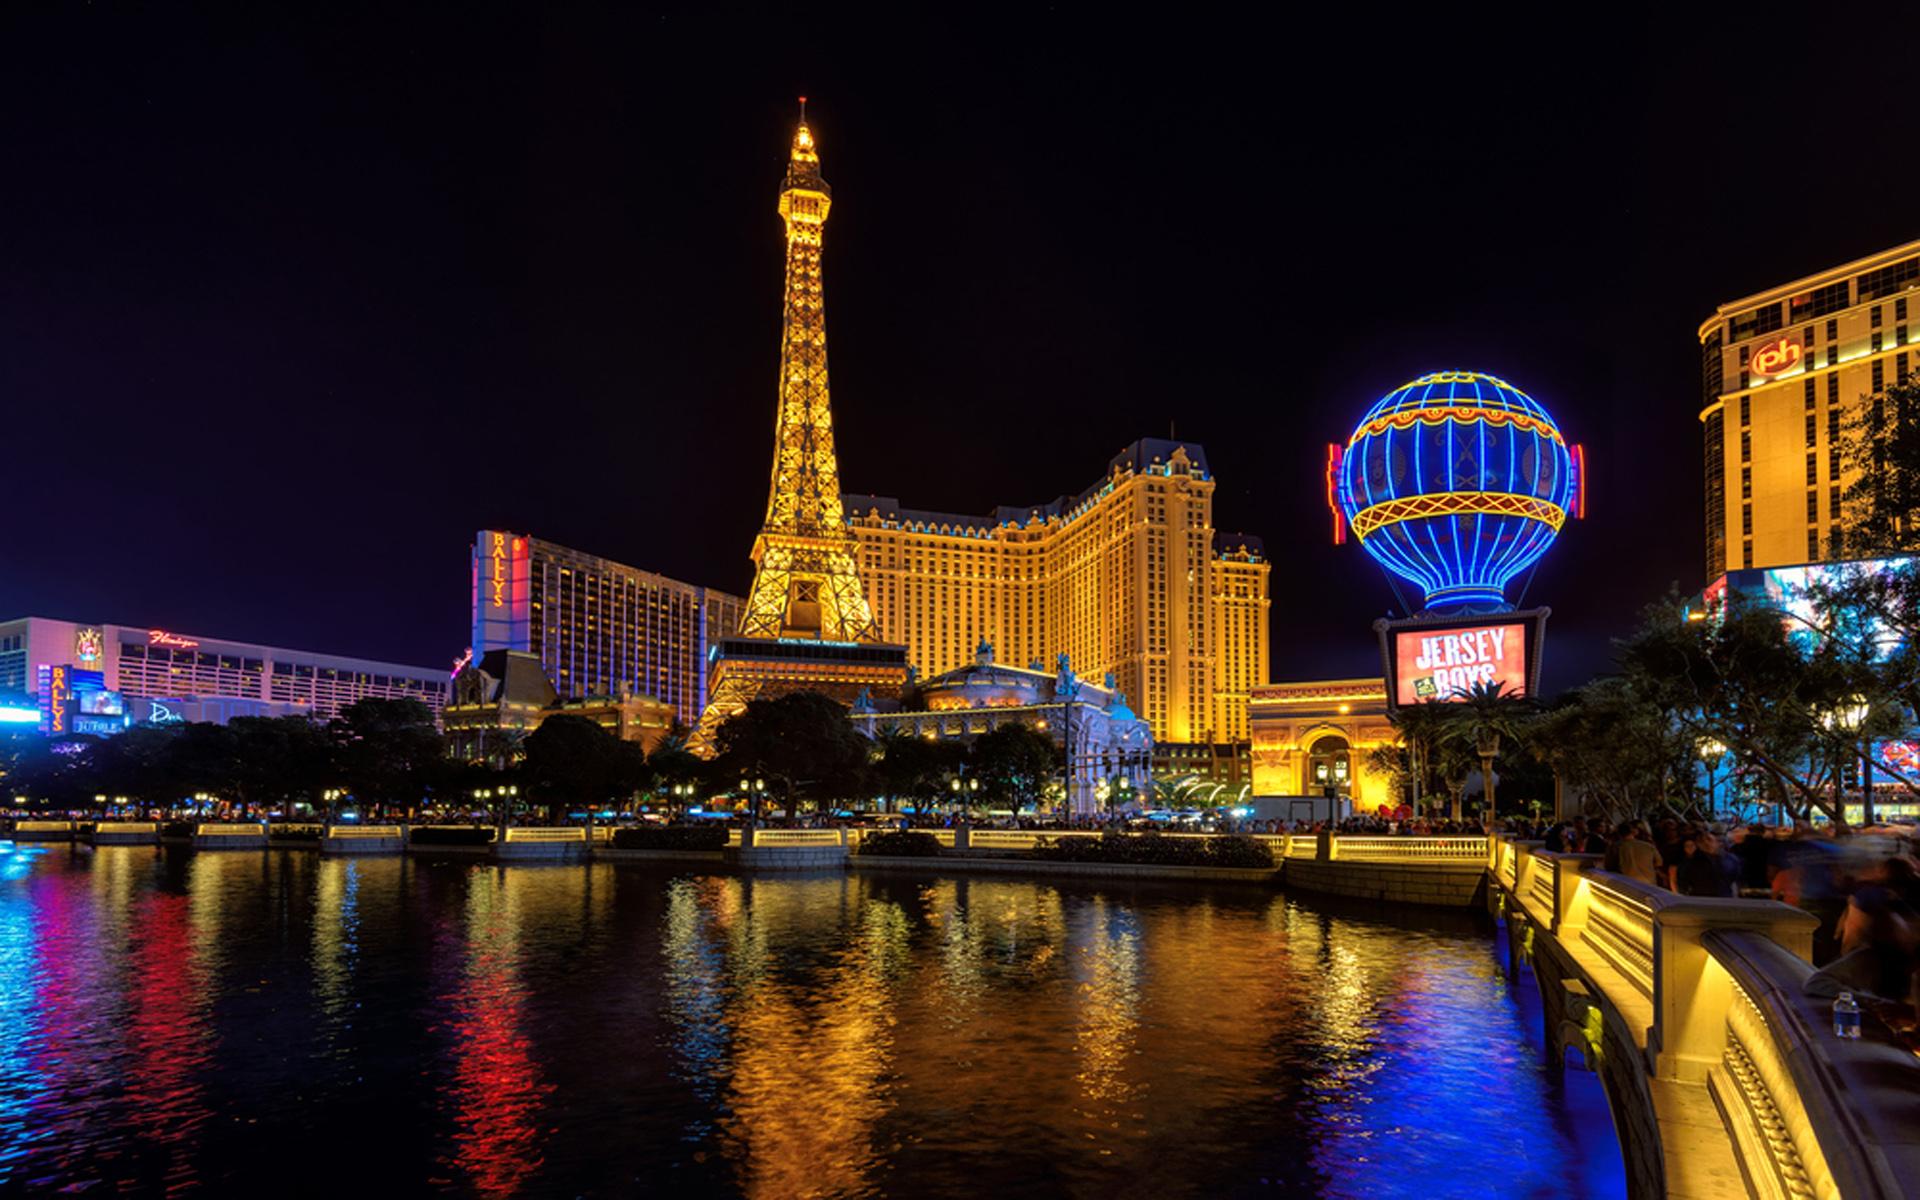 Berlin Wallpaper Hd Hotel Paris And Eiffel Tower In Las Vegas Nevada Desktop